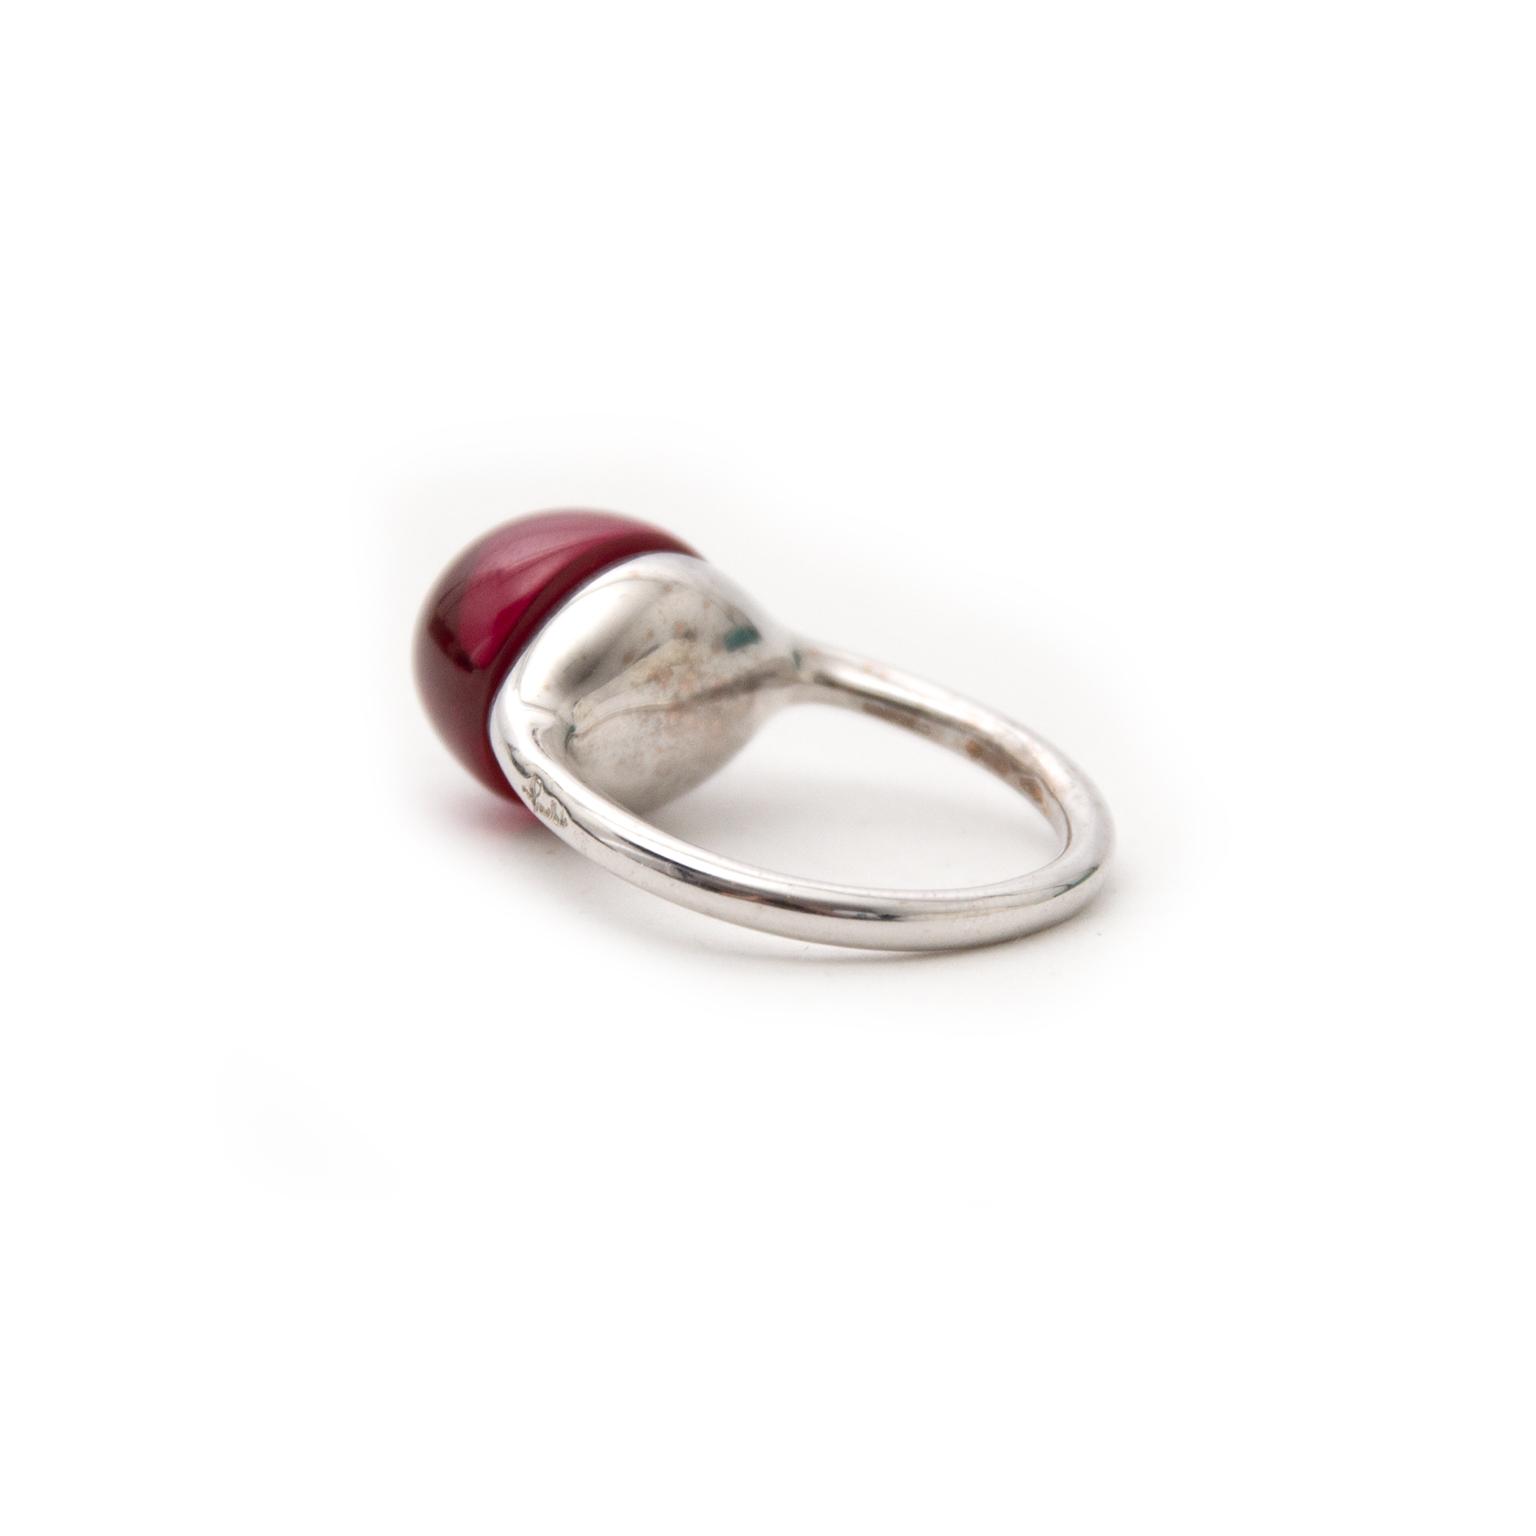 Pomellato Ring Rouge Passion Ruby Stone nu online bij labellov.com tegen de beste prijs